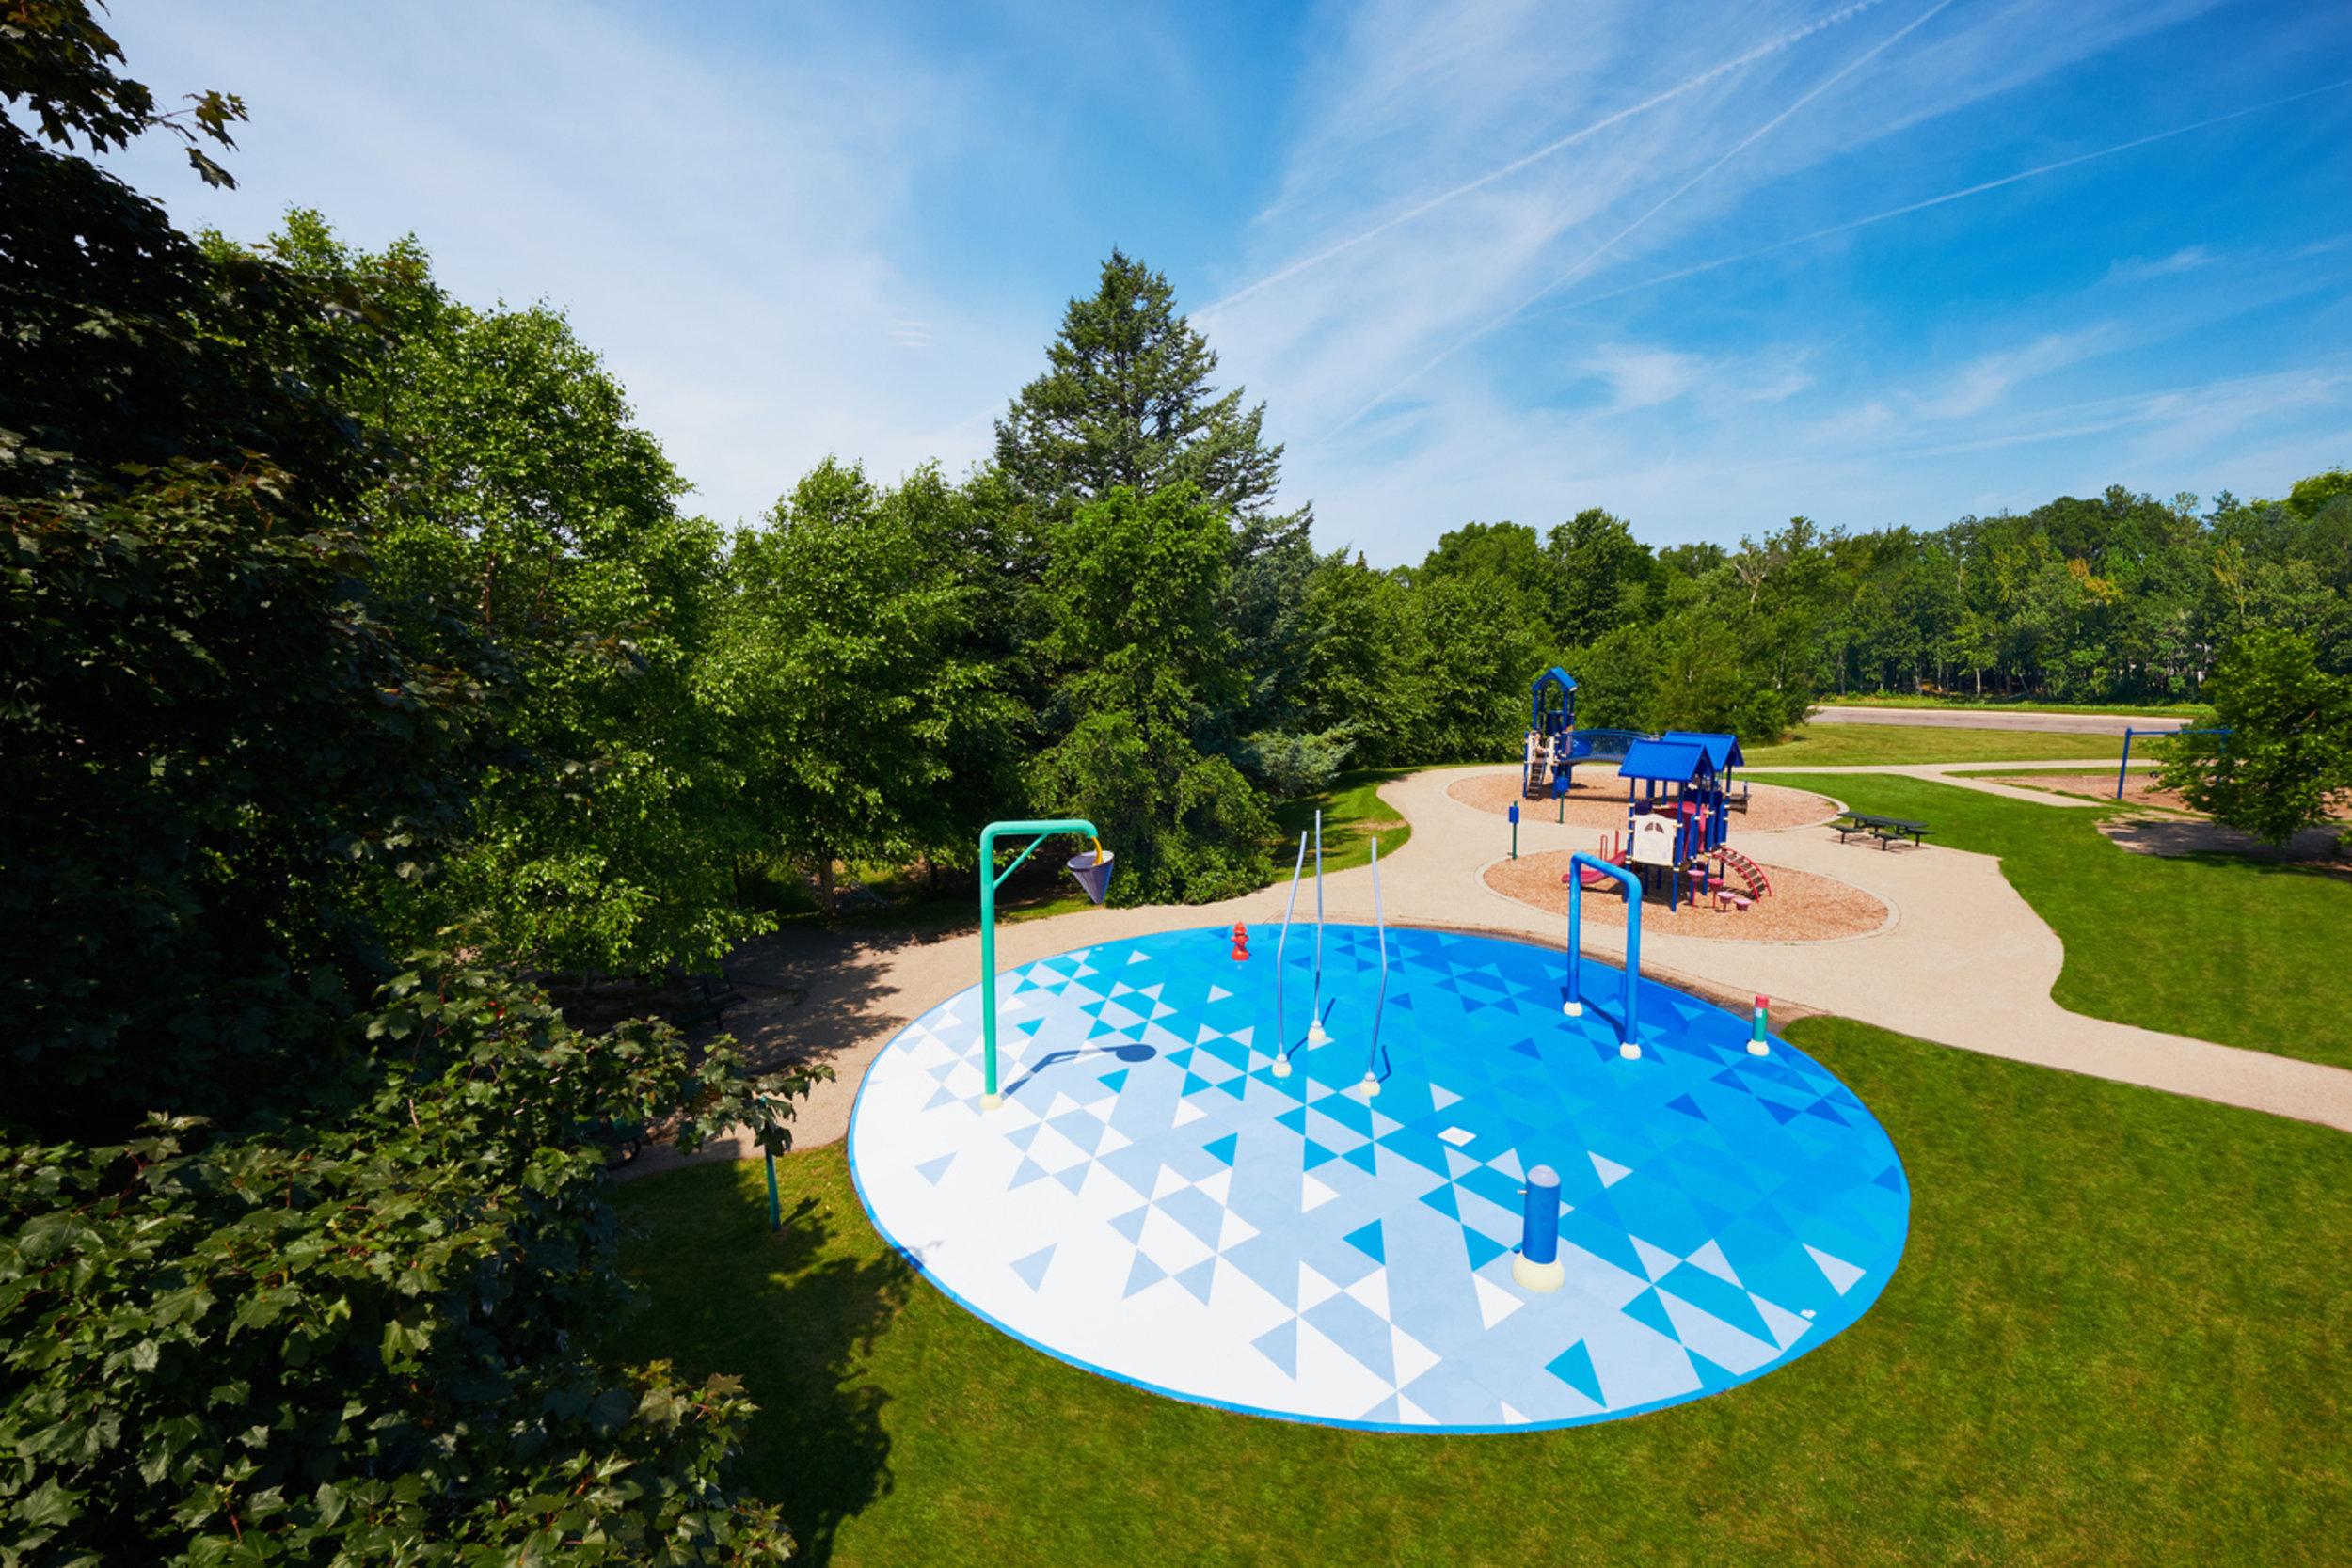 Cedarcrest Park Splash Pad